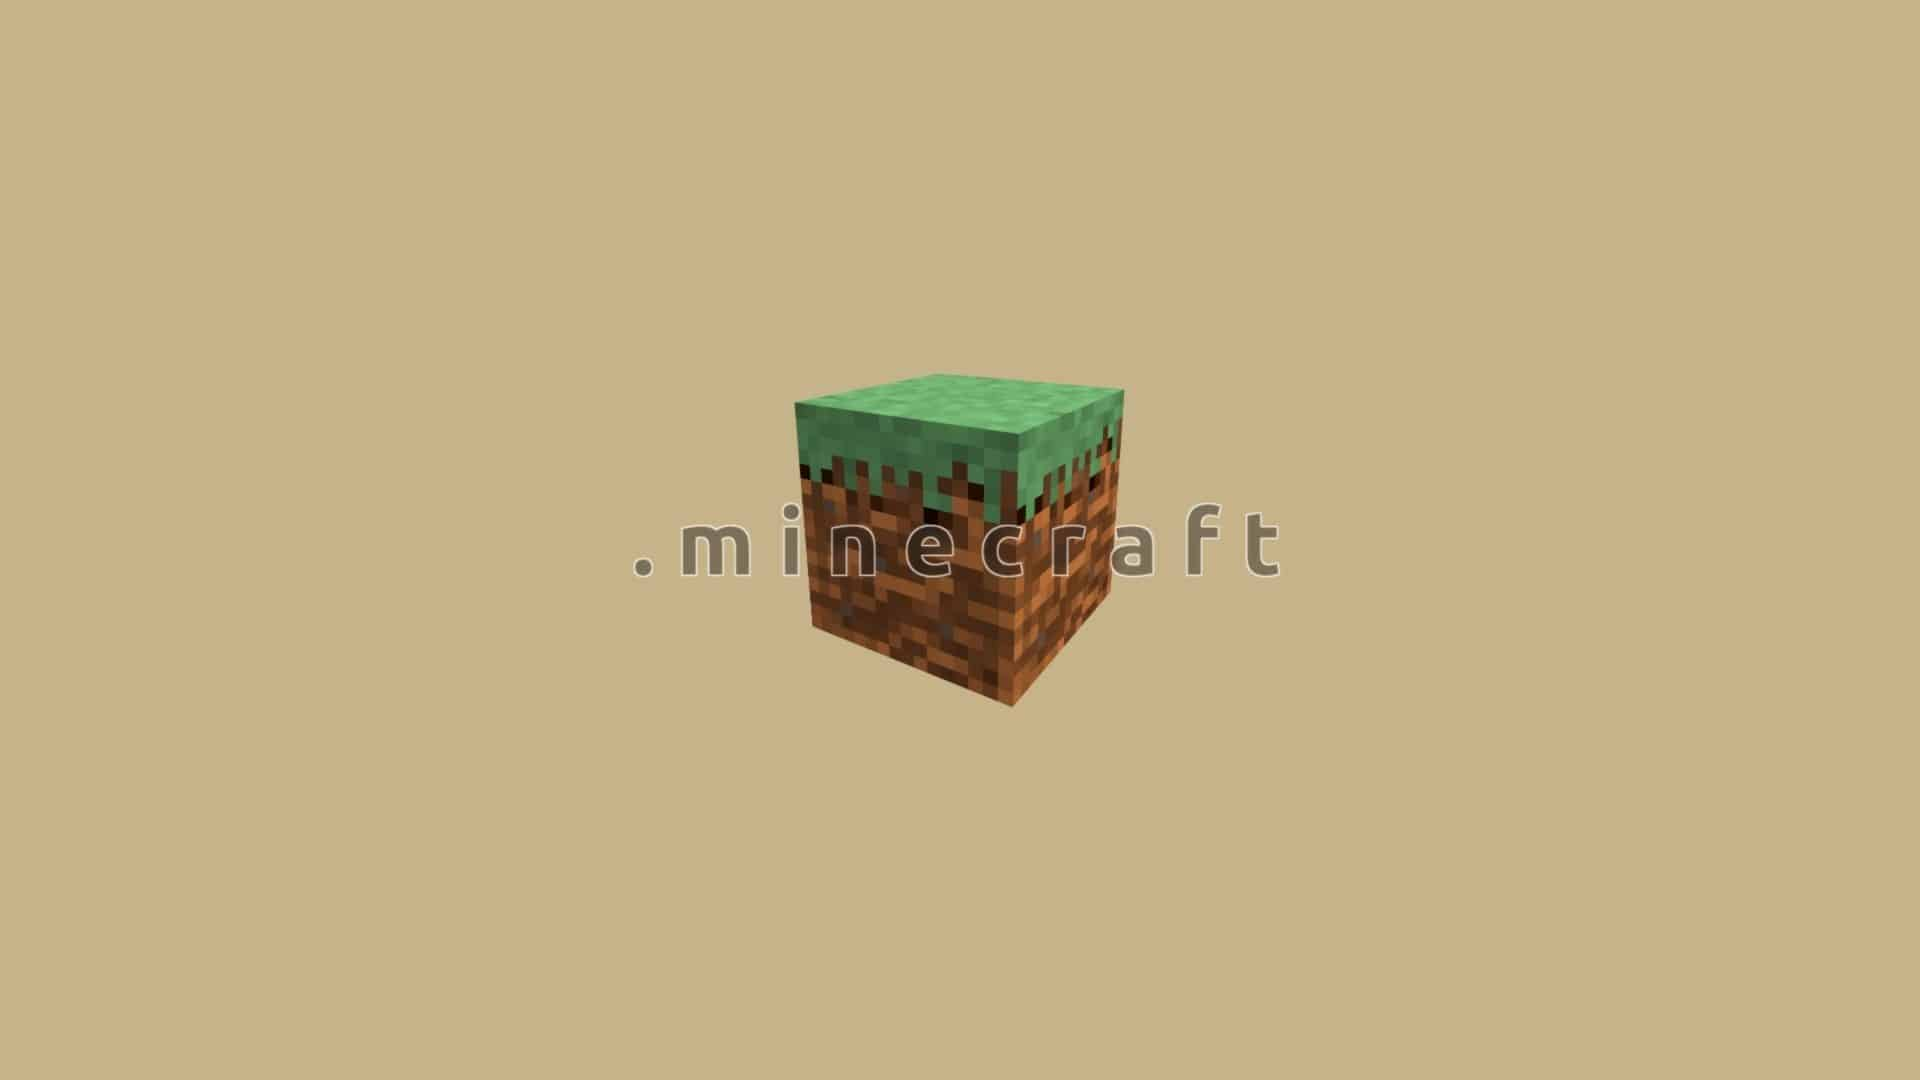 ______m_i_n_e_c_r_a_f_t_____dirt_block_wallpaper_by_sonyrootkit-d4j3x1q